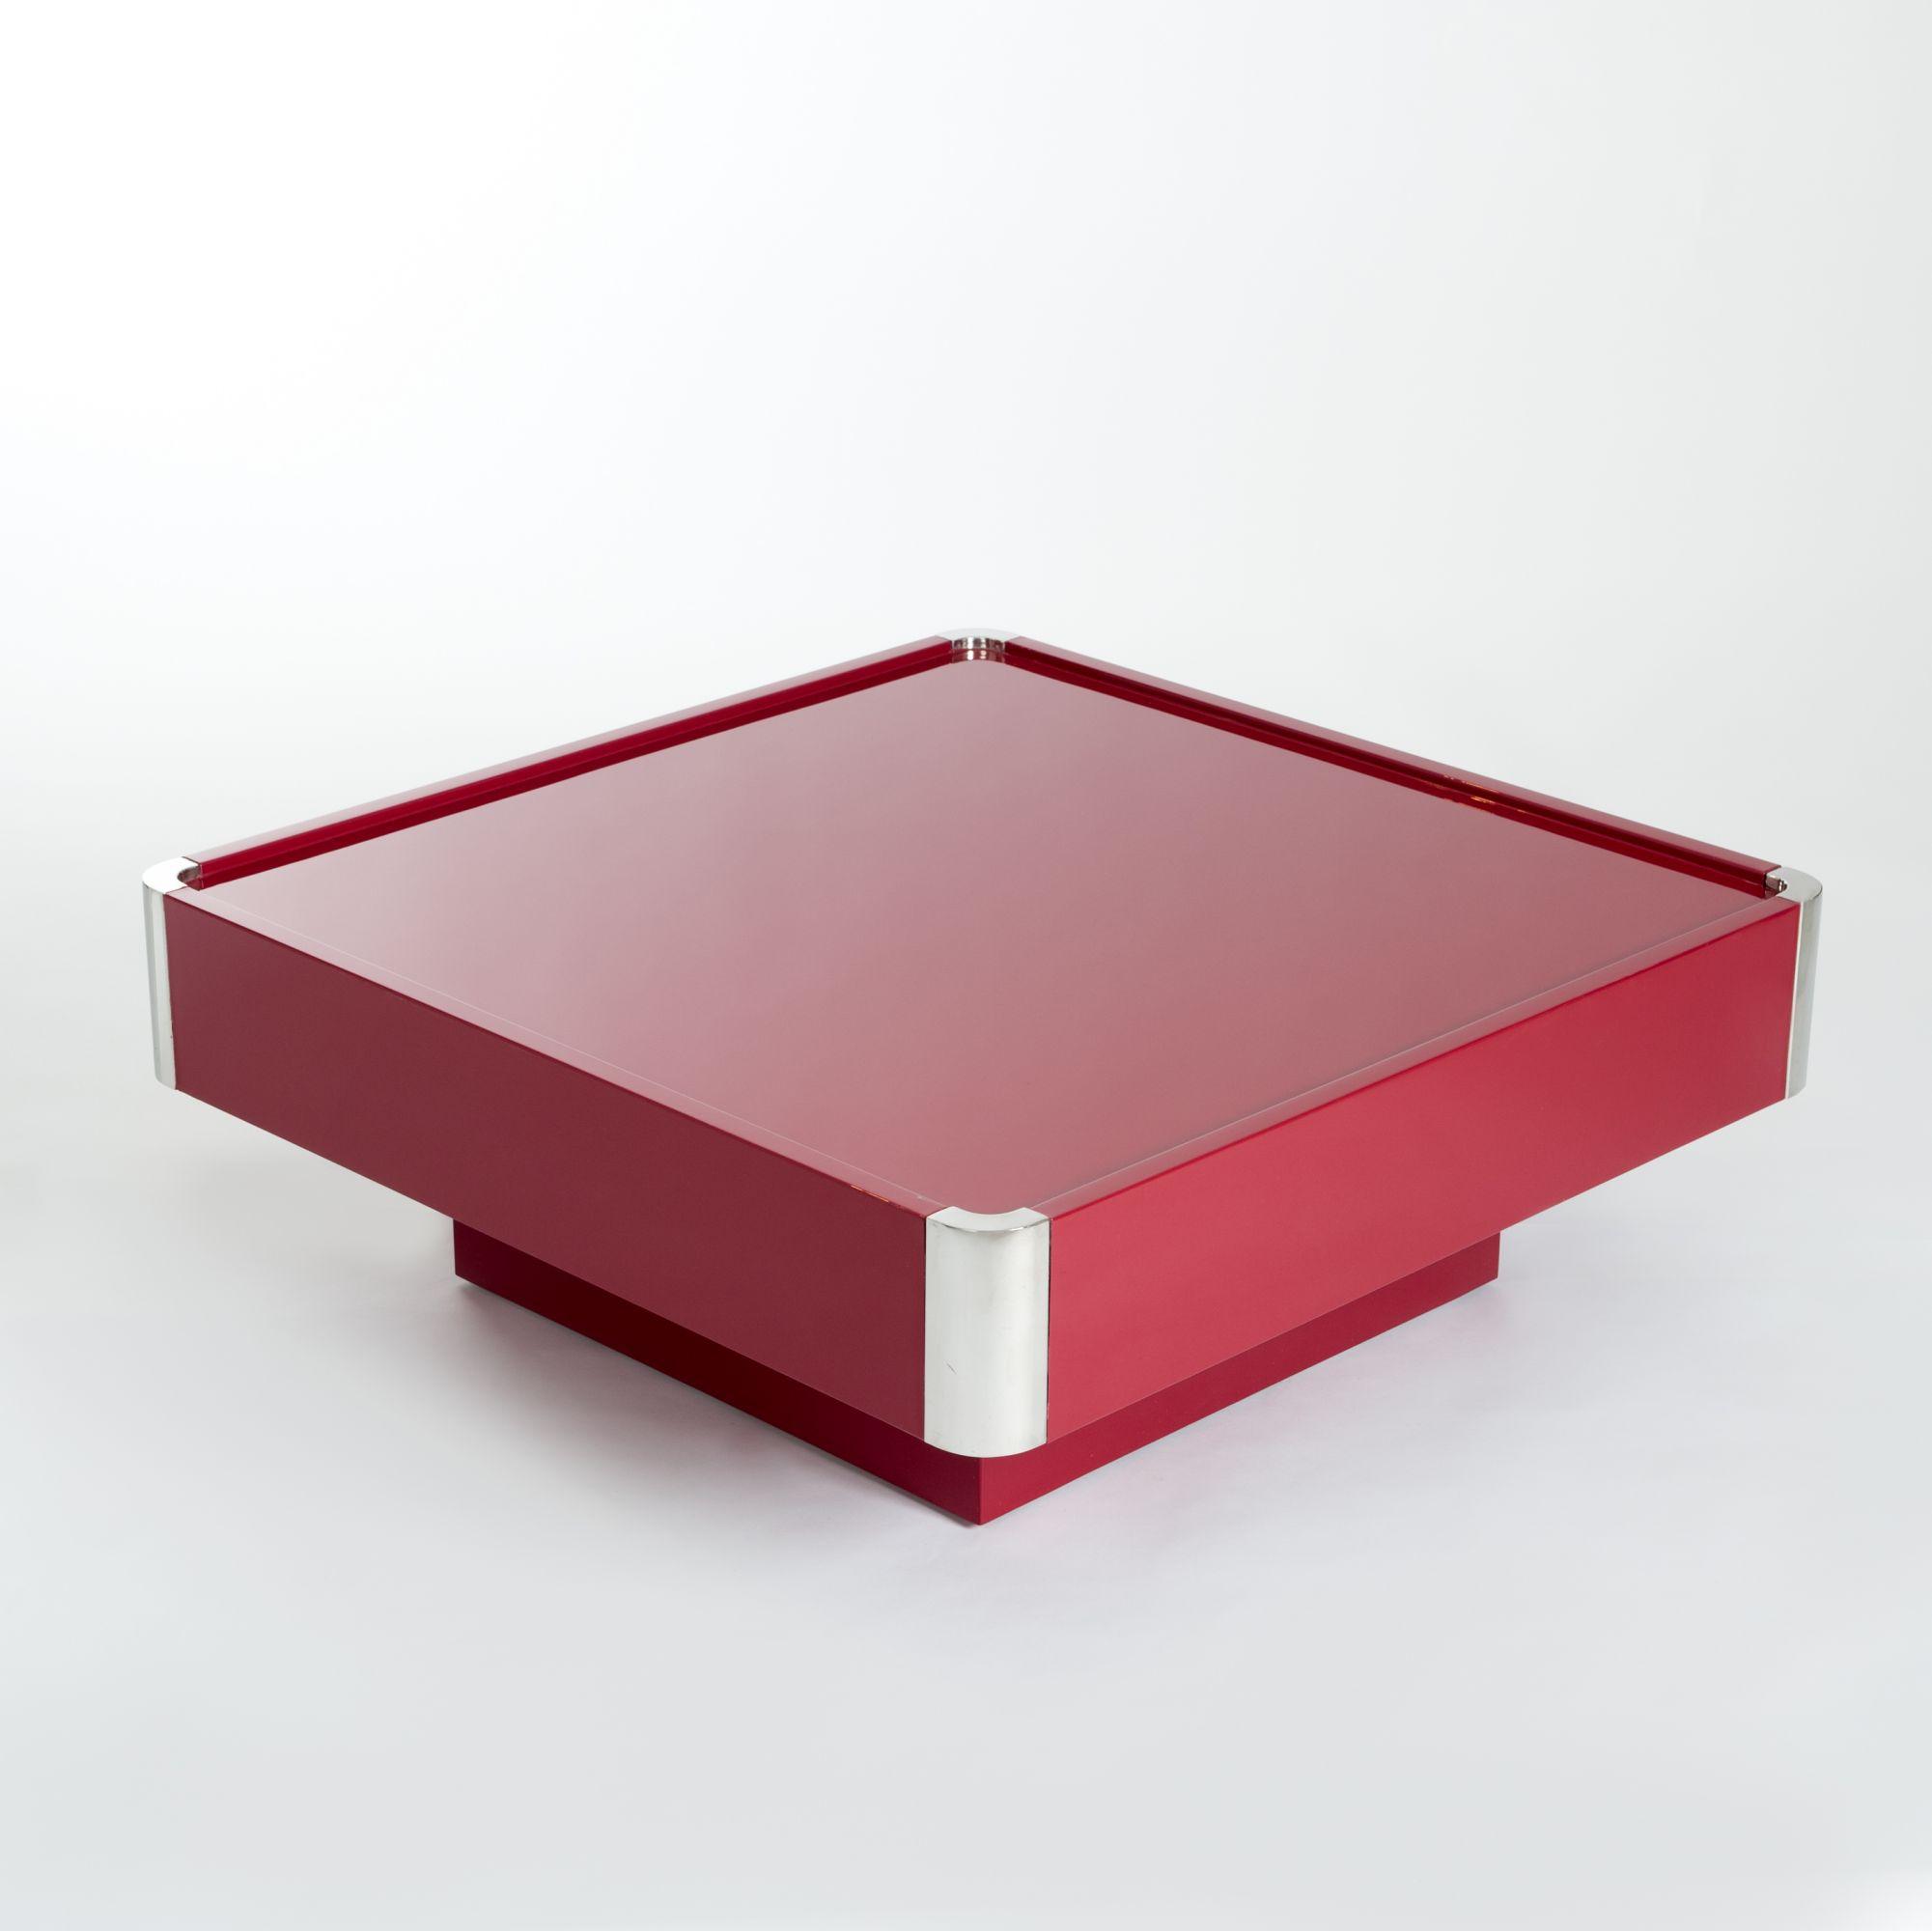 Midcentury Italian Square Dark Red Coffee Table By Mario Sabot